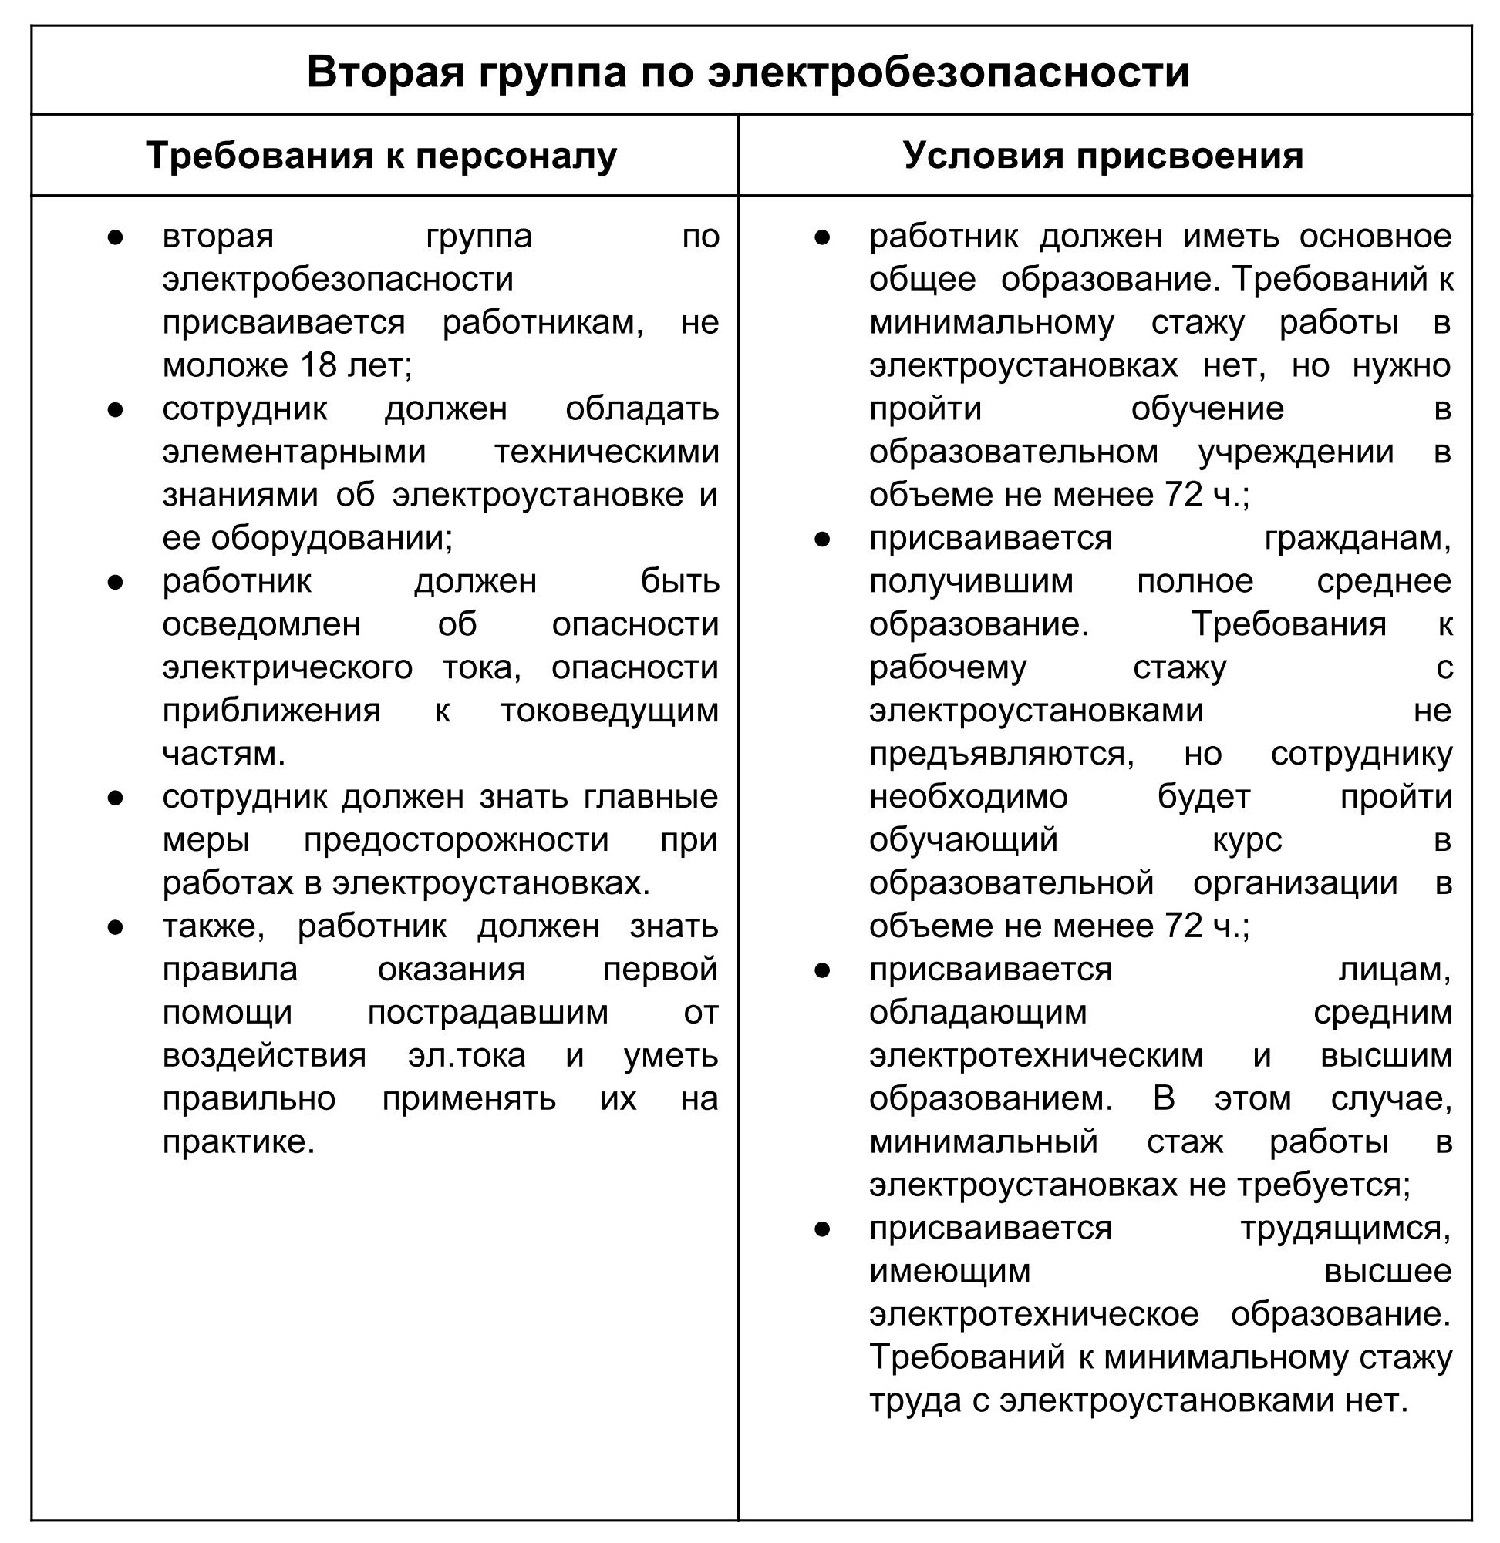 тесты электробезопасности 3 группа